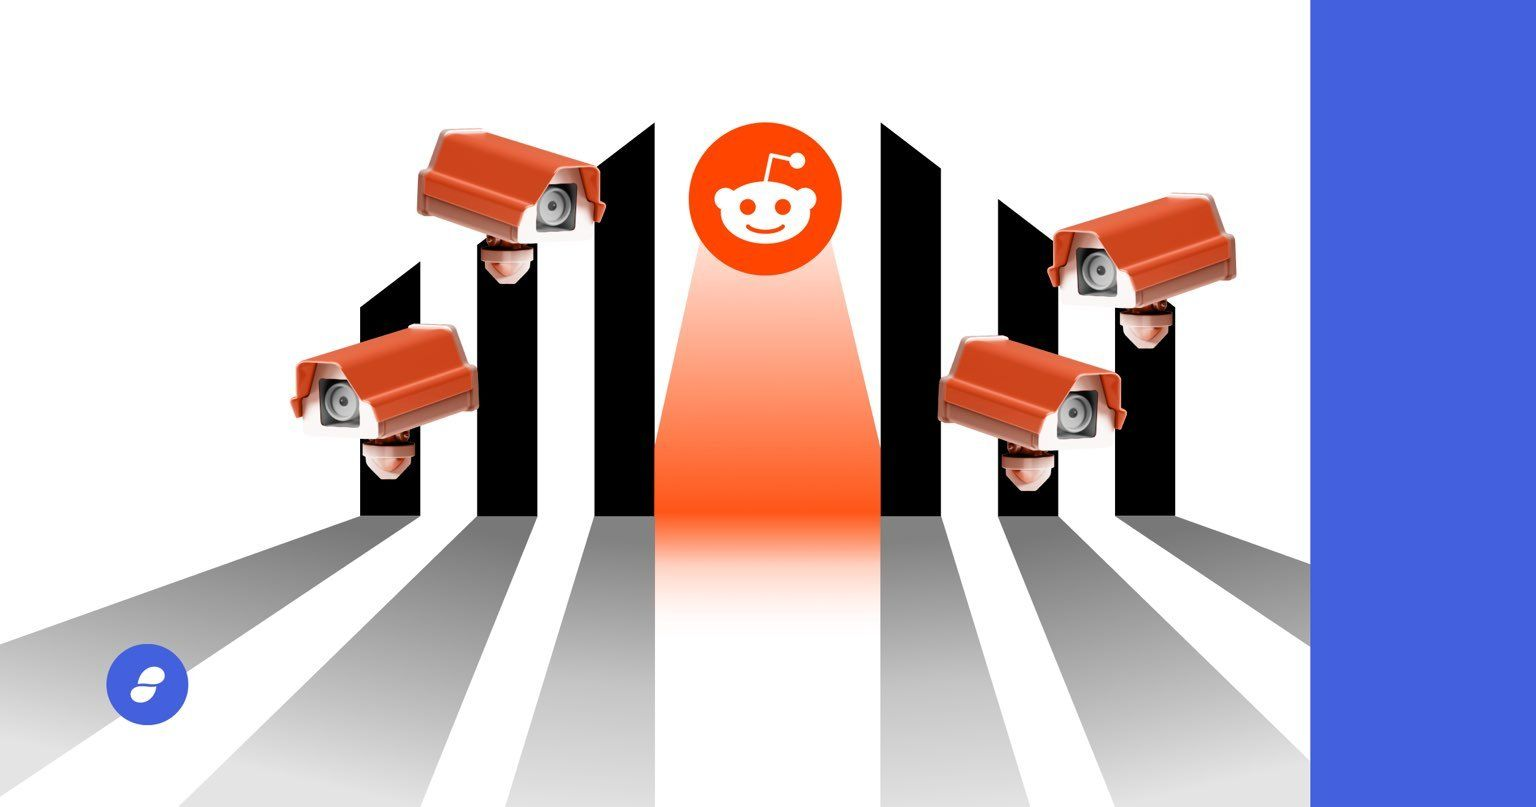 Reddit: Centralization erodes privacy